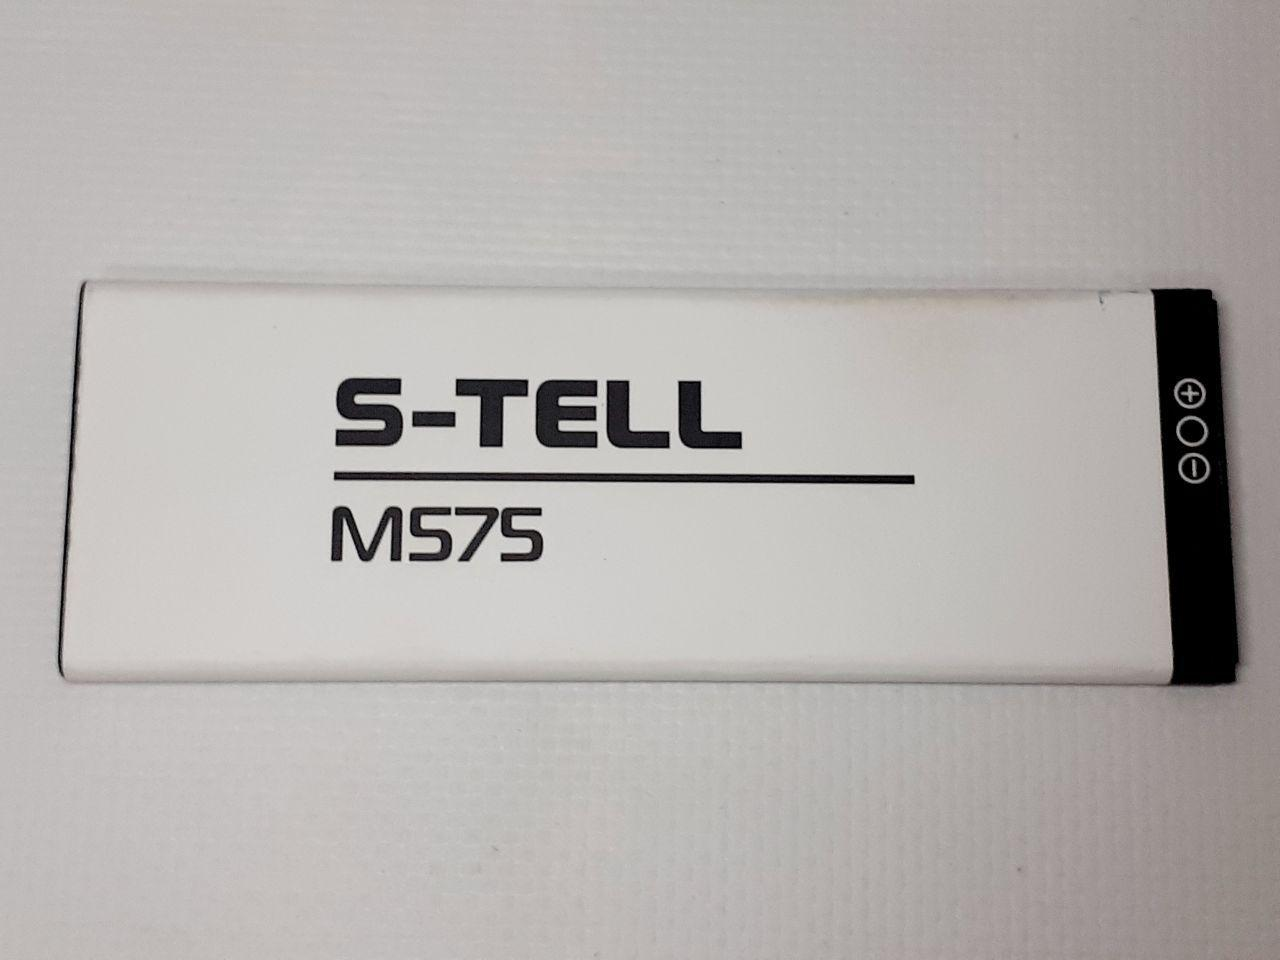 Аккумулятор S-tell M575 (Li-ion 3.8V 2050mAh) оригинал , сервисный